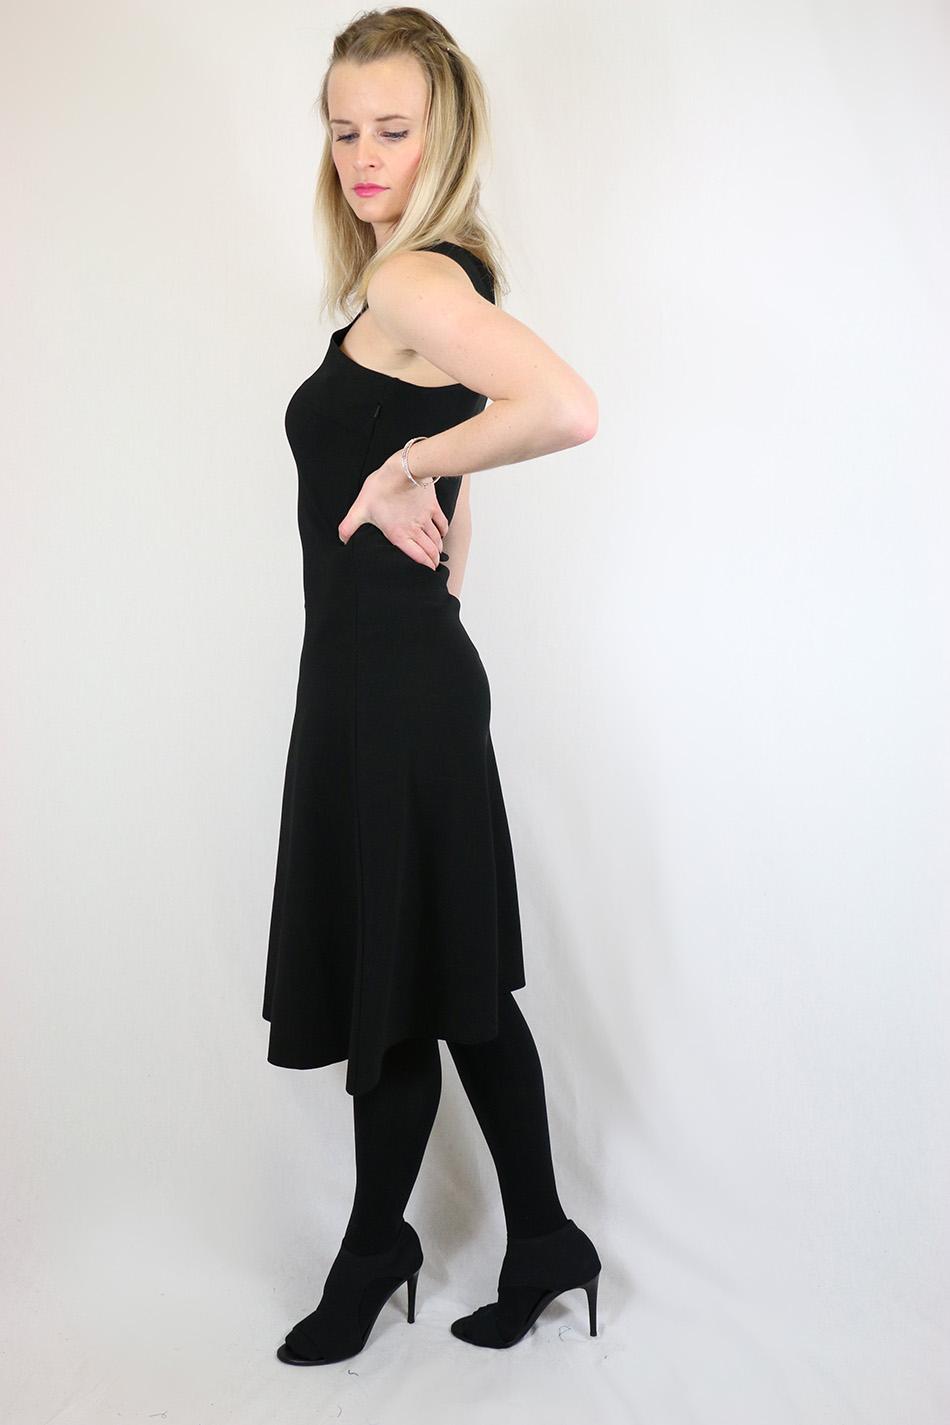 Fringe and Doll Black A-line dress IMG_1704